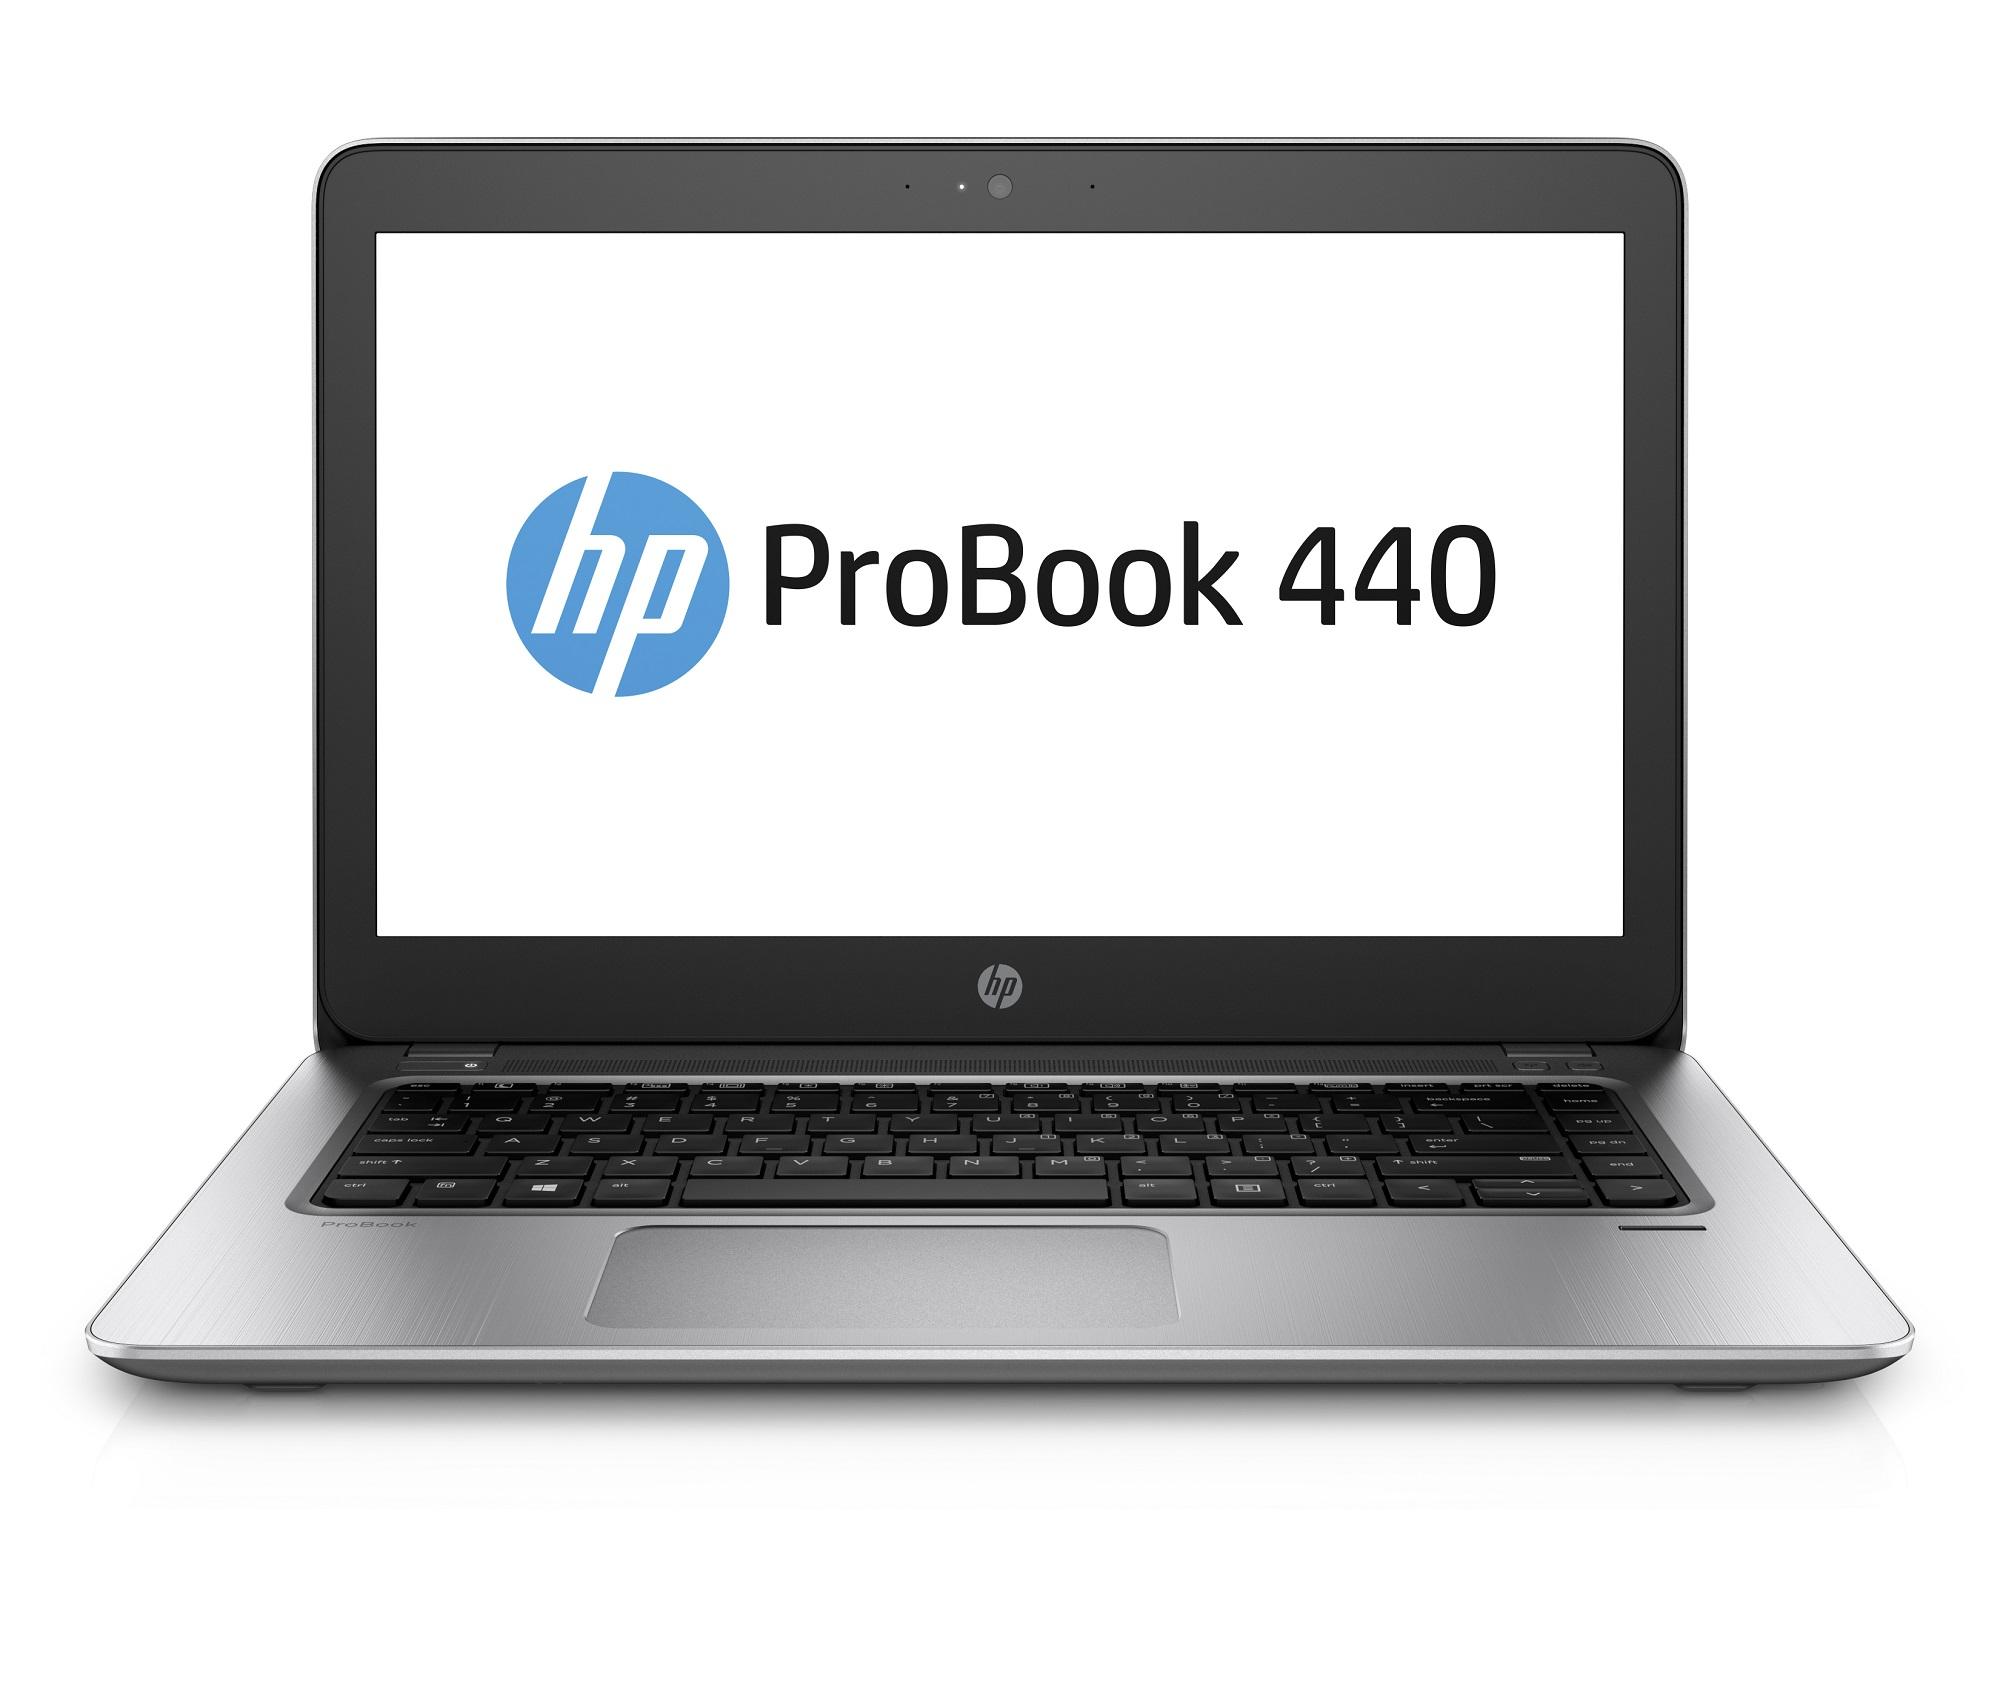 "HP ProBook 440 G4 14"" FHD/i3-7100U/4G/256SSD/VGA/HDMI/RJ45/WIFI/BT/MCR/FPR/1Rservis/W10P"